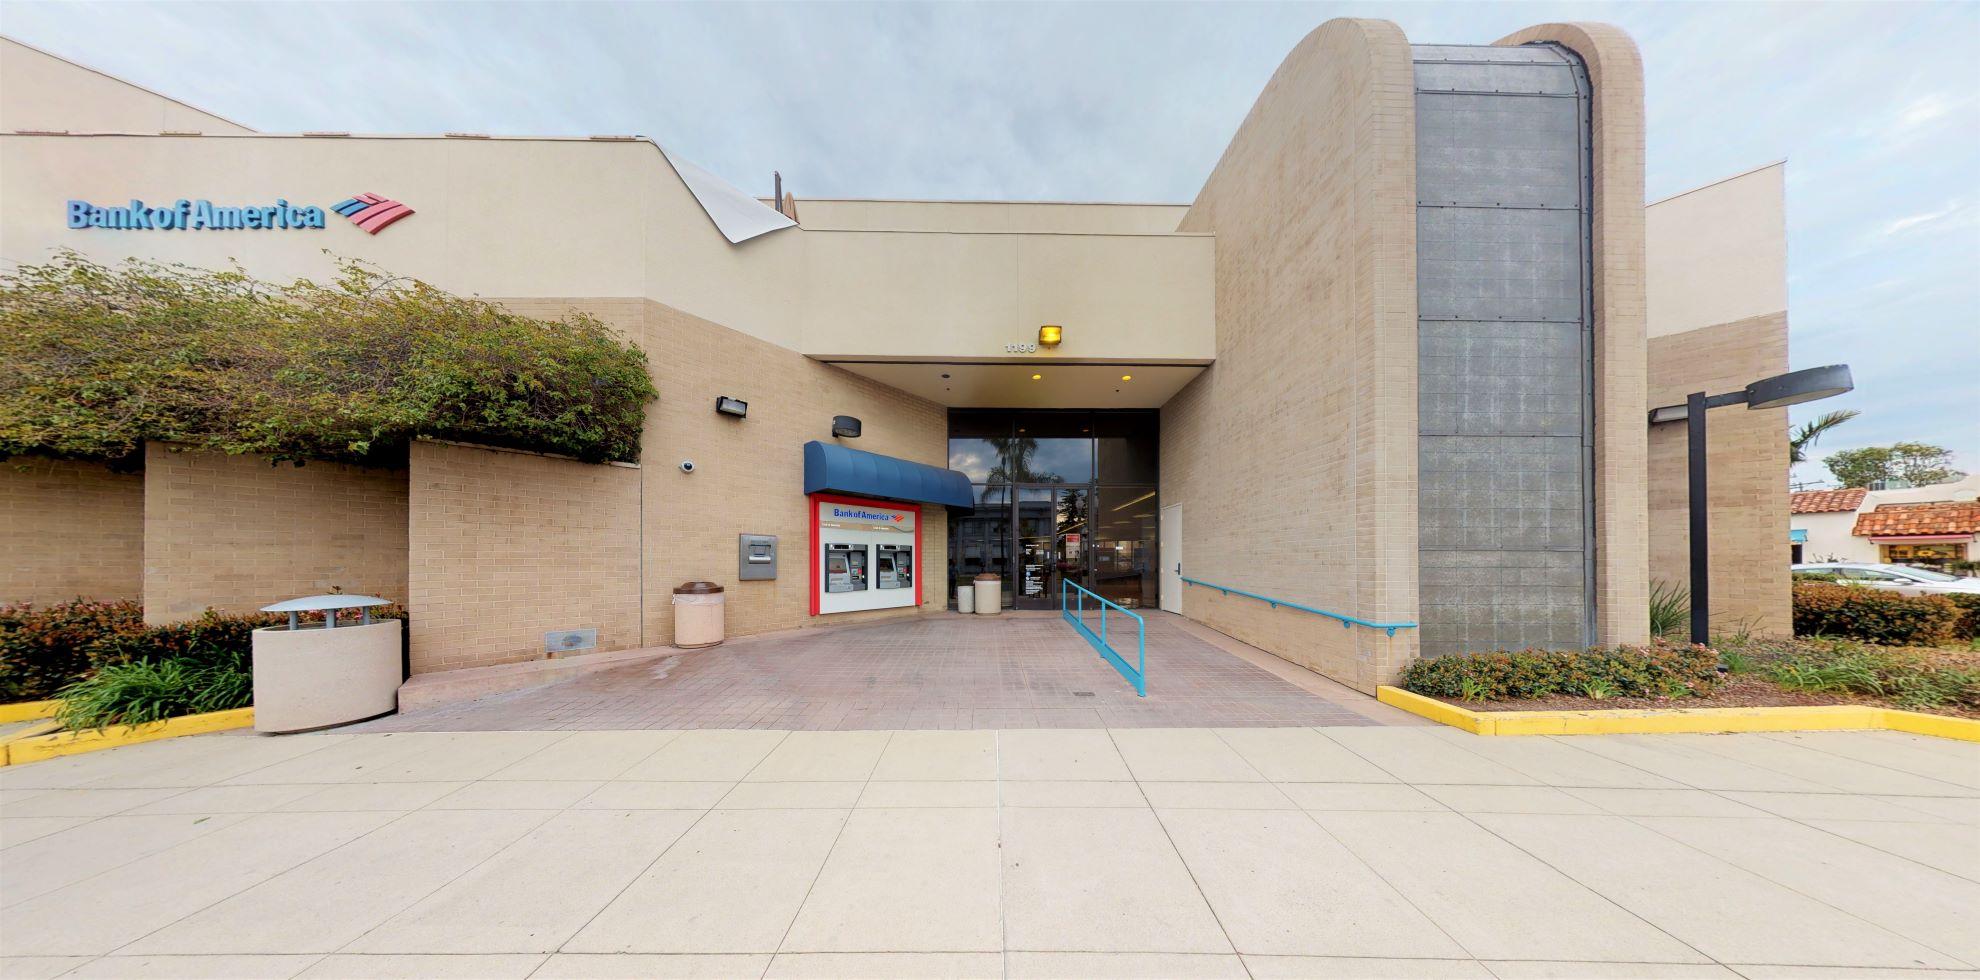 Bank of America financial center with walk-up ATM | 1199 Orange Ave, Coronado, CA 92118